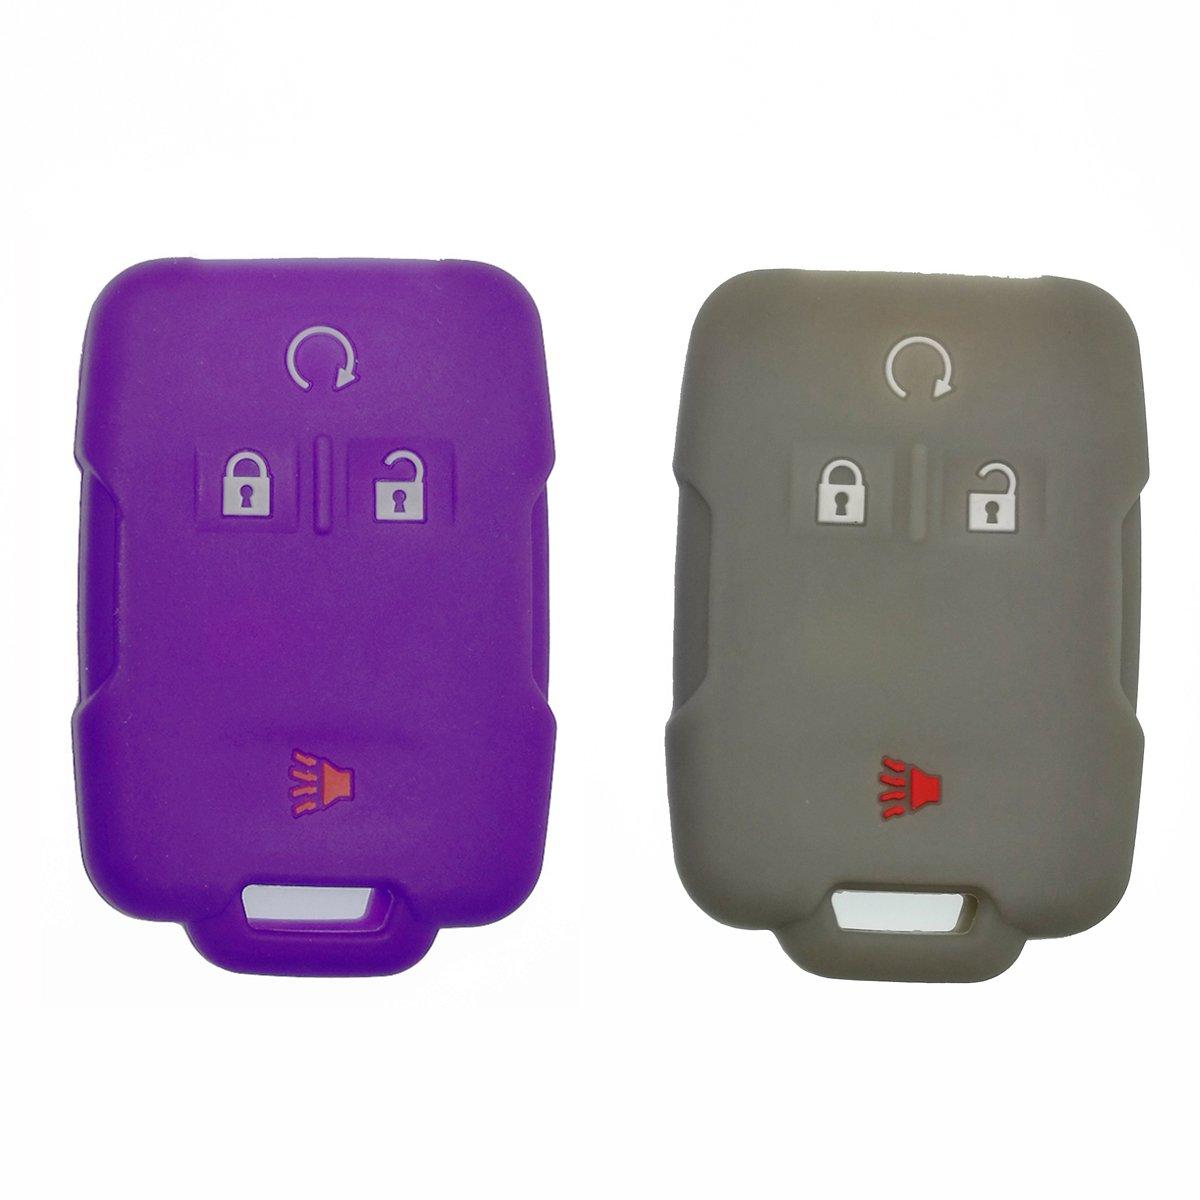 Coolbestda 2Pcs Rubber 4 Buttons Smart Key Fob Case Cover Remote Protector Holder for 2018 2017 2016 Chevrolet Chevy Silverado Colorado GMC Canyon Sierra Yukon Cadillac M3N32337100 13577770 13577771